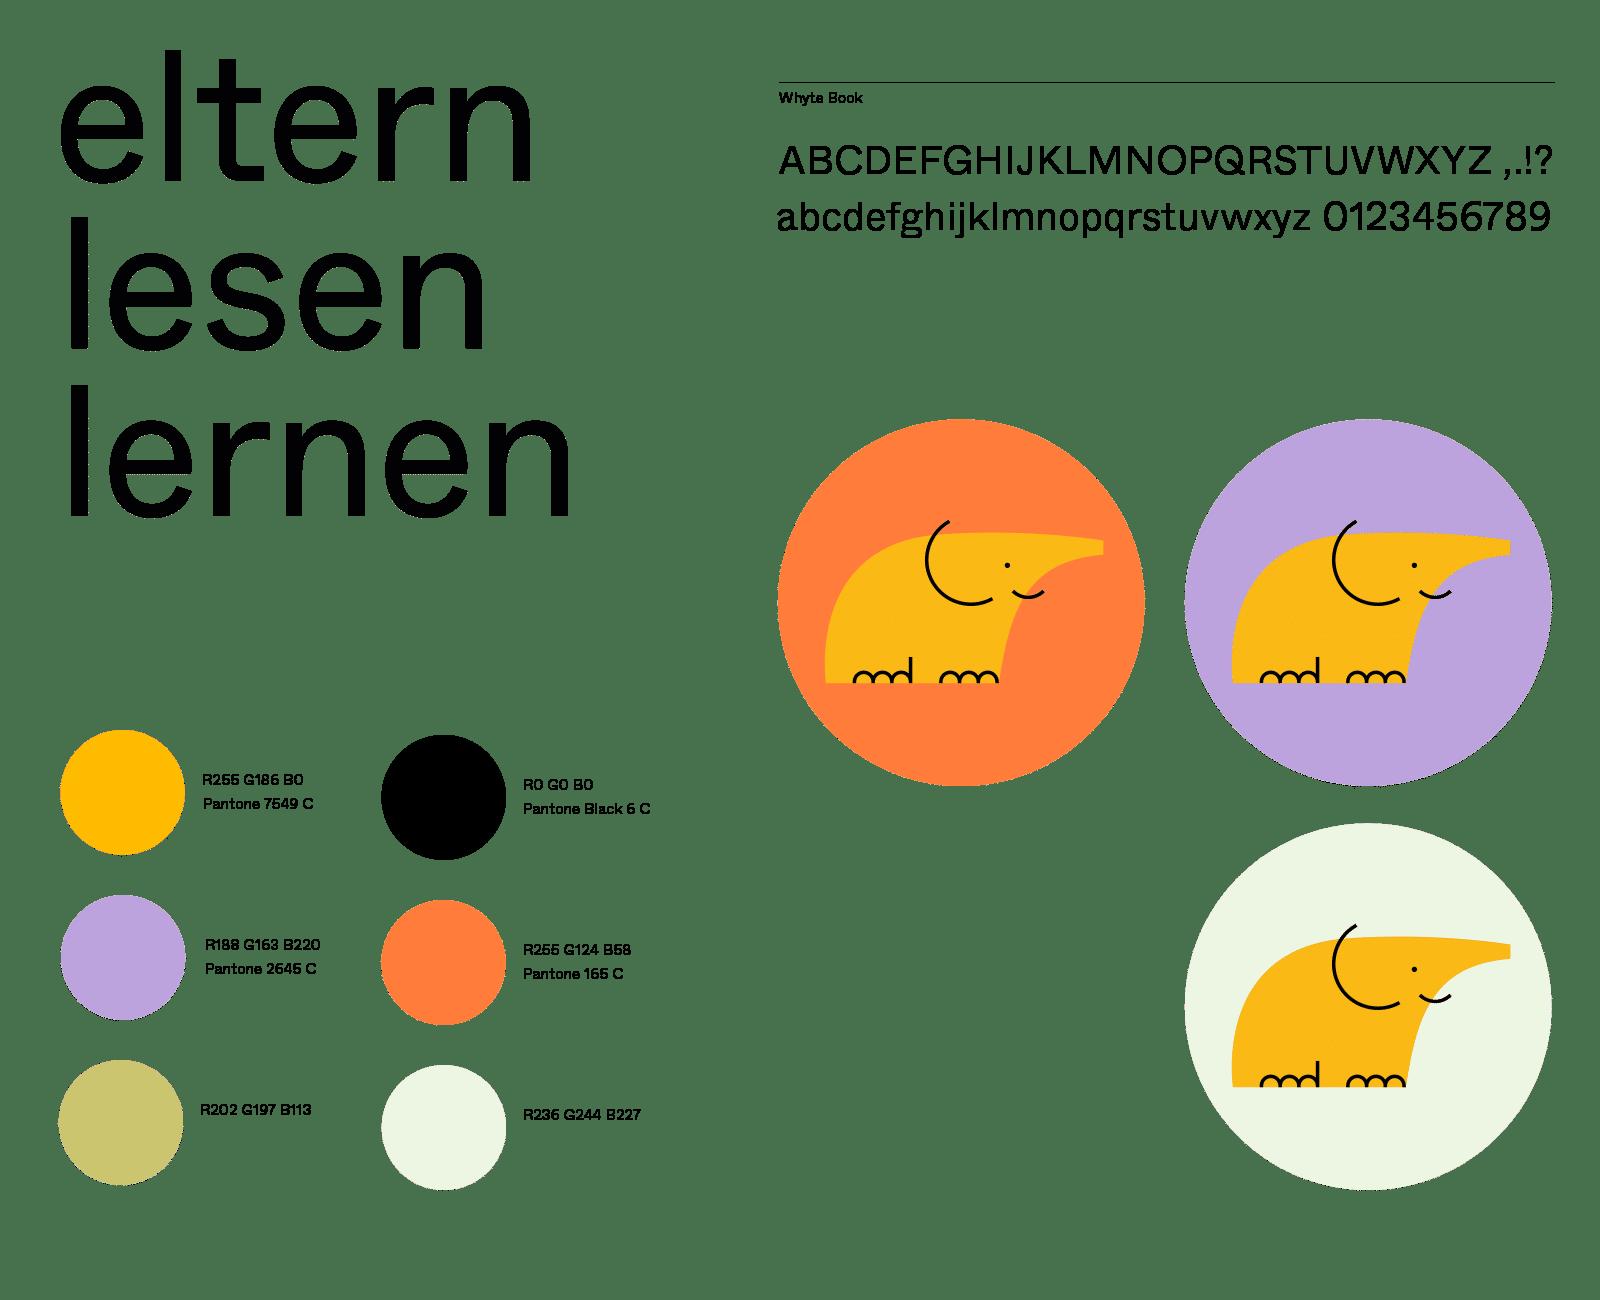 Stiftung Lesen DesignStiftung Lesen DesignStiftung Lesen Design